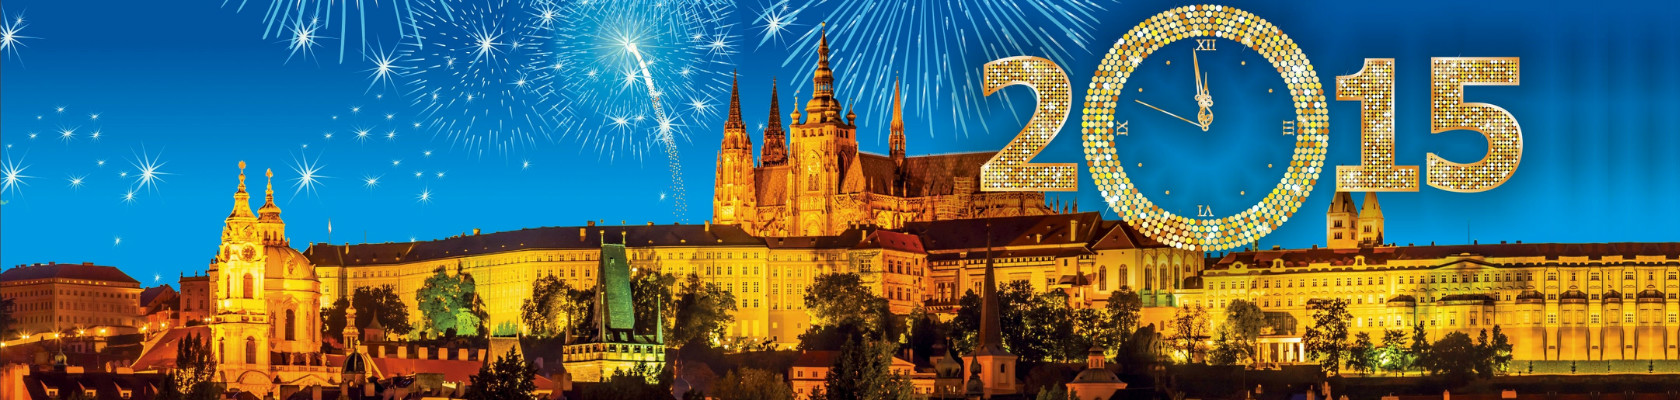 PRAG NOVA GODINA 2015.